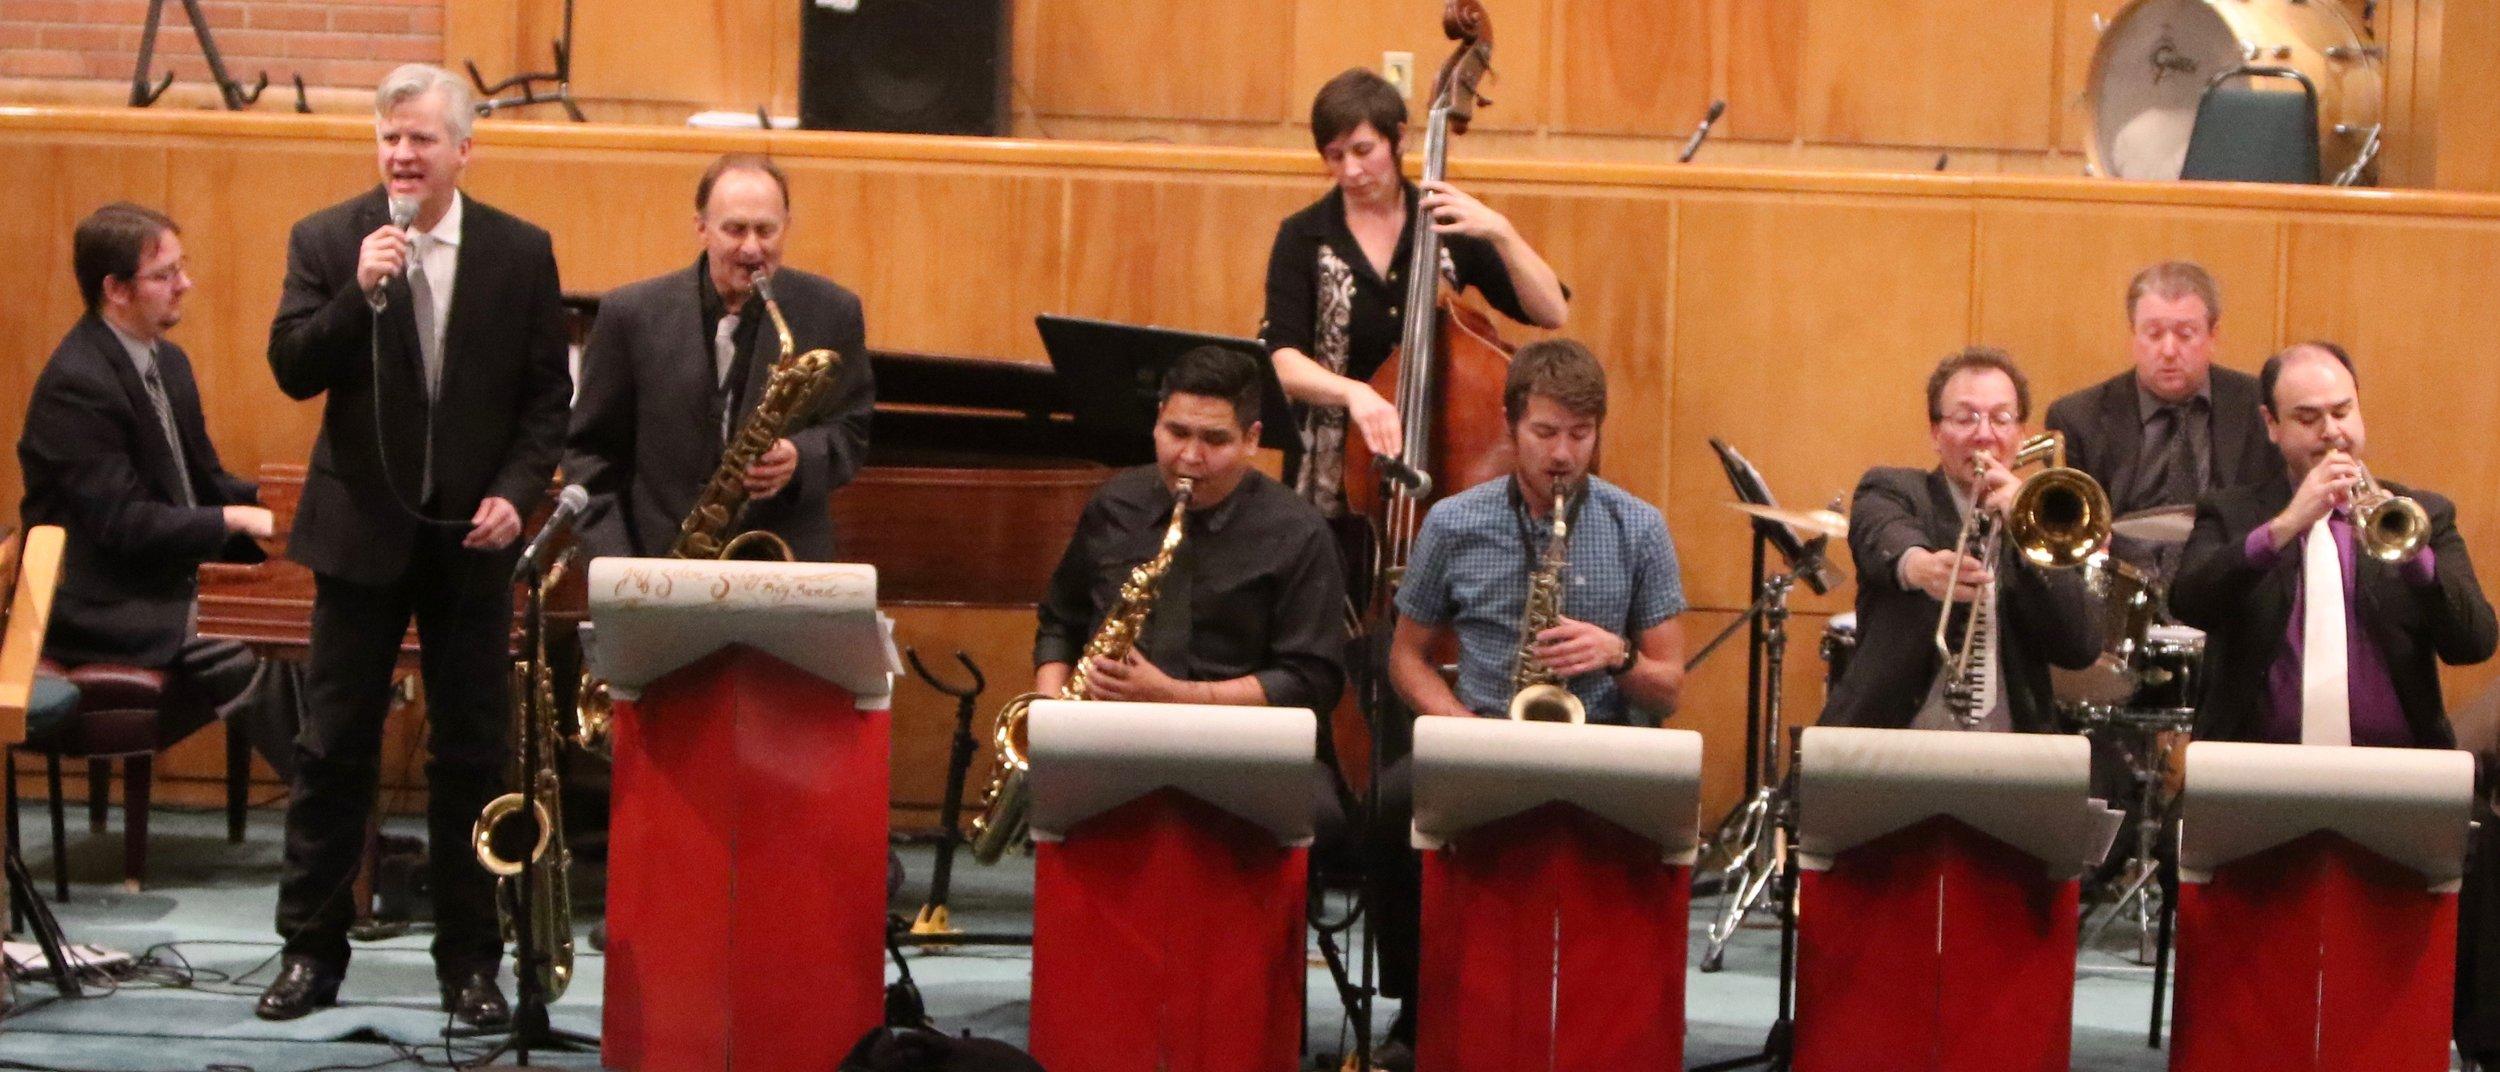 The Swing'n Big Band Photo By Rick Greenaker